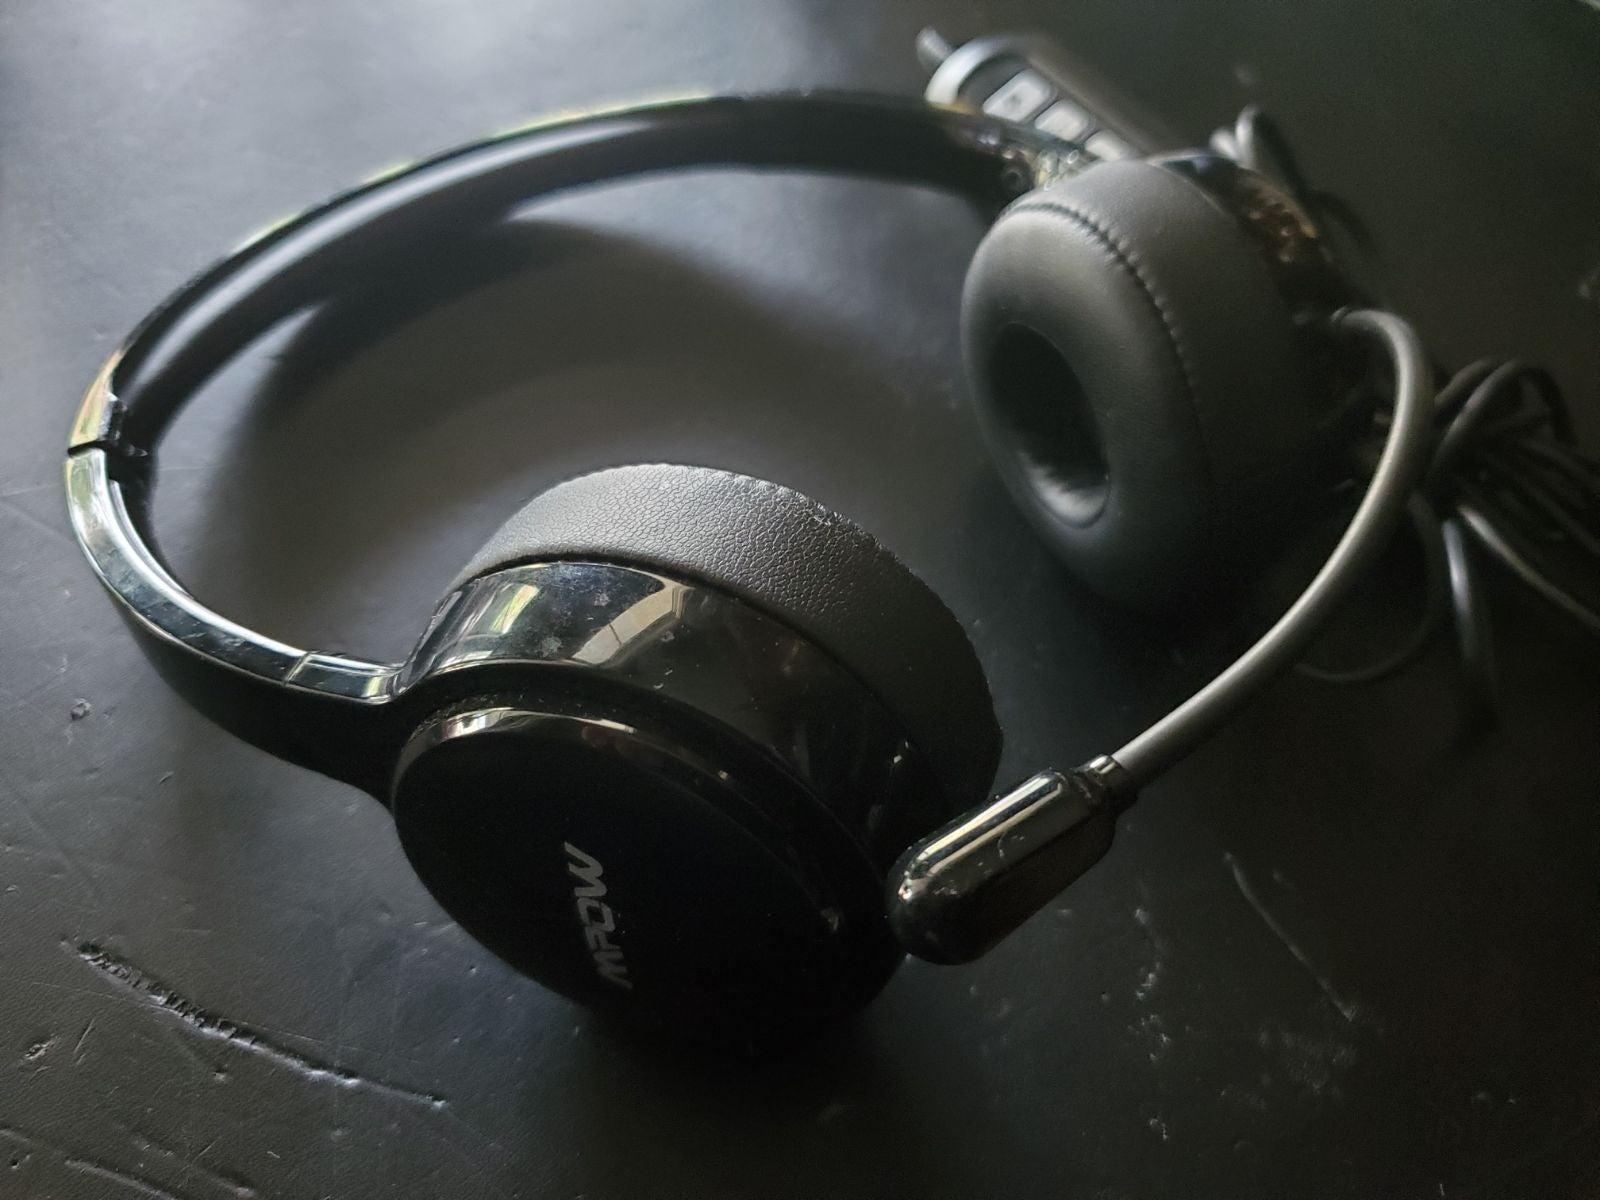 USB headset